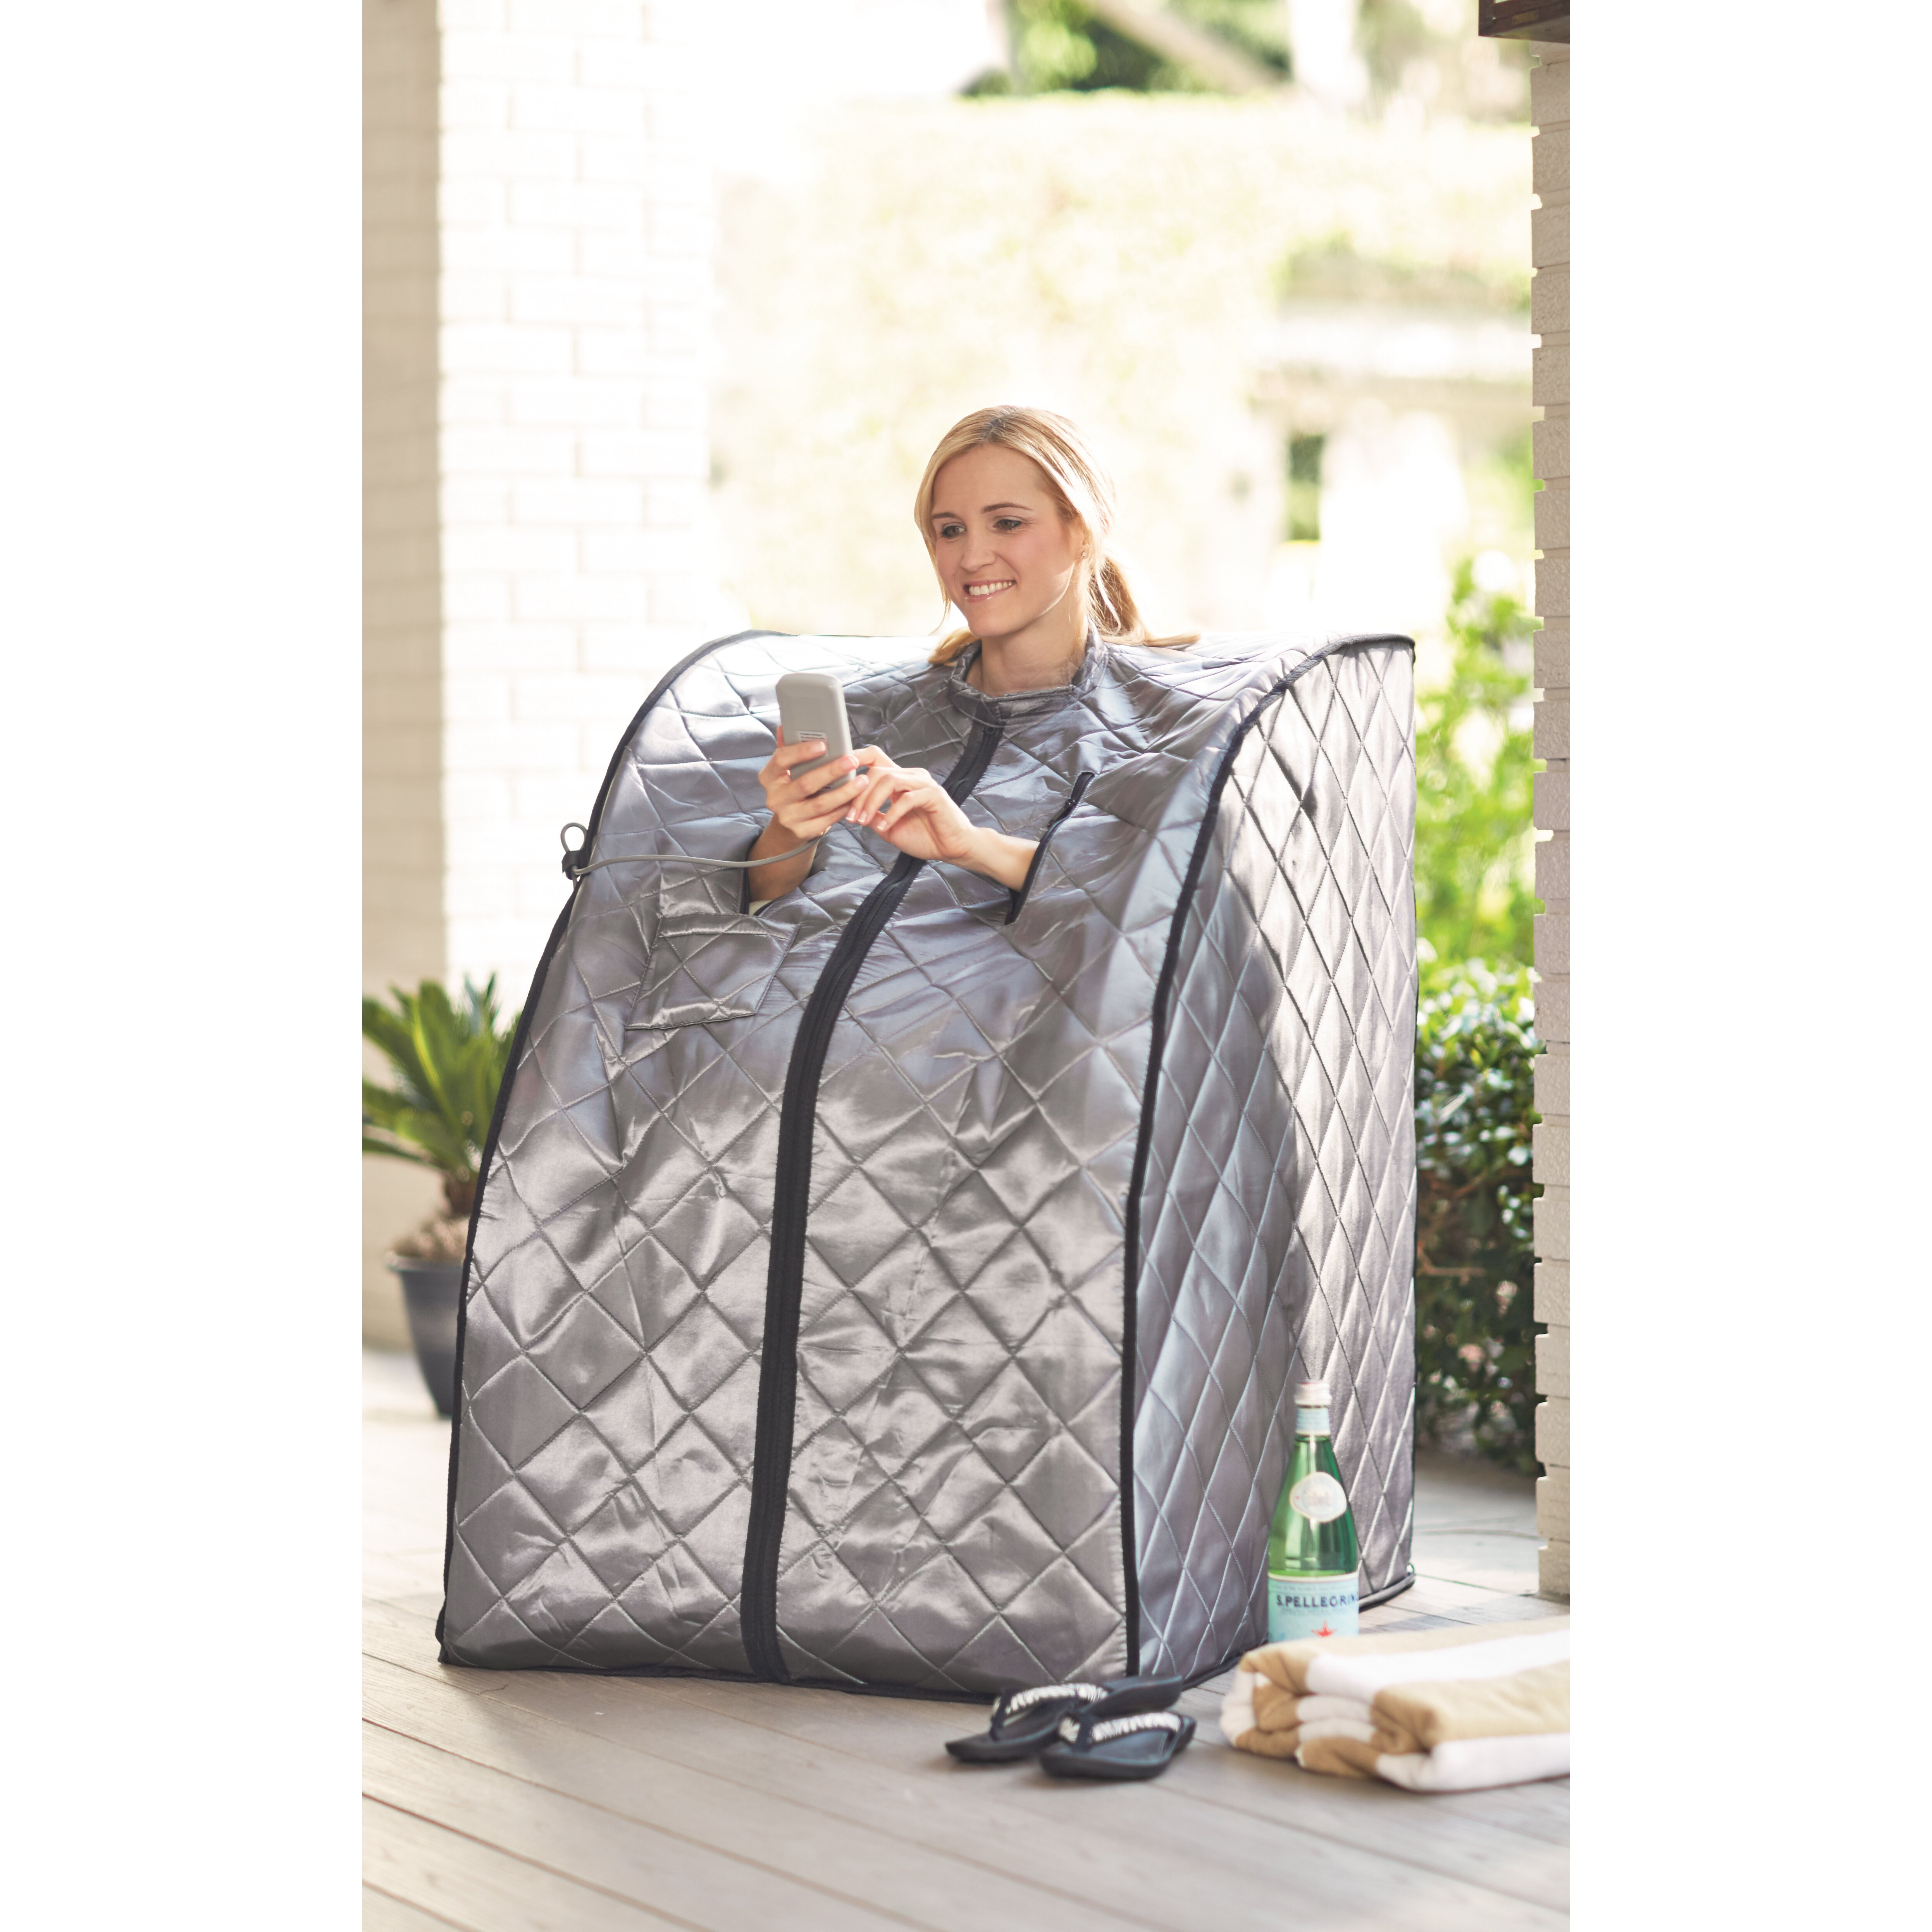 radiant saunas 1 person rejuvenator portable sauna reviews wayfair. Black Bedroom Furniture Sets. Home Design Ideas